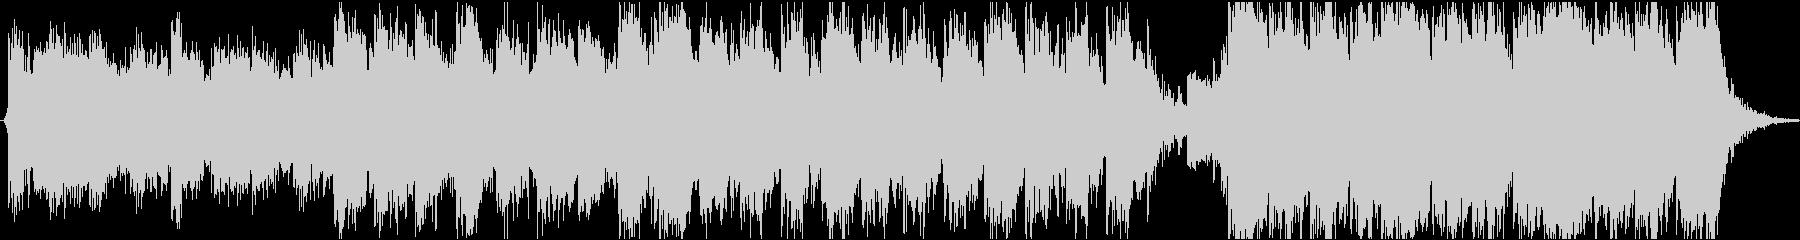 Cinematic Musicの未再生の波形